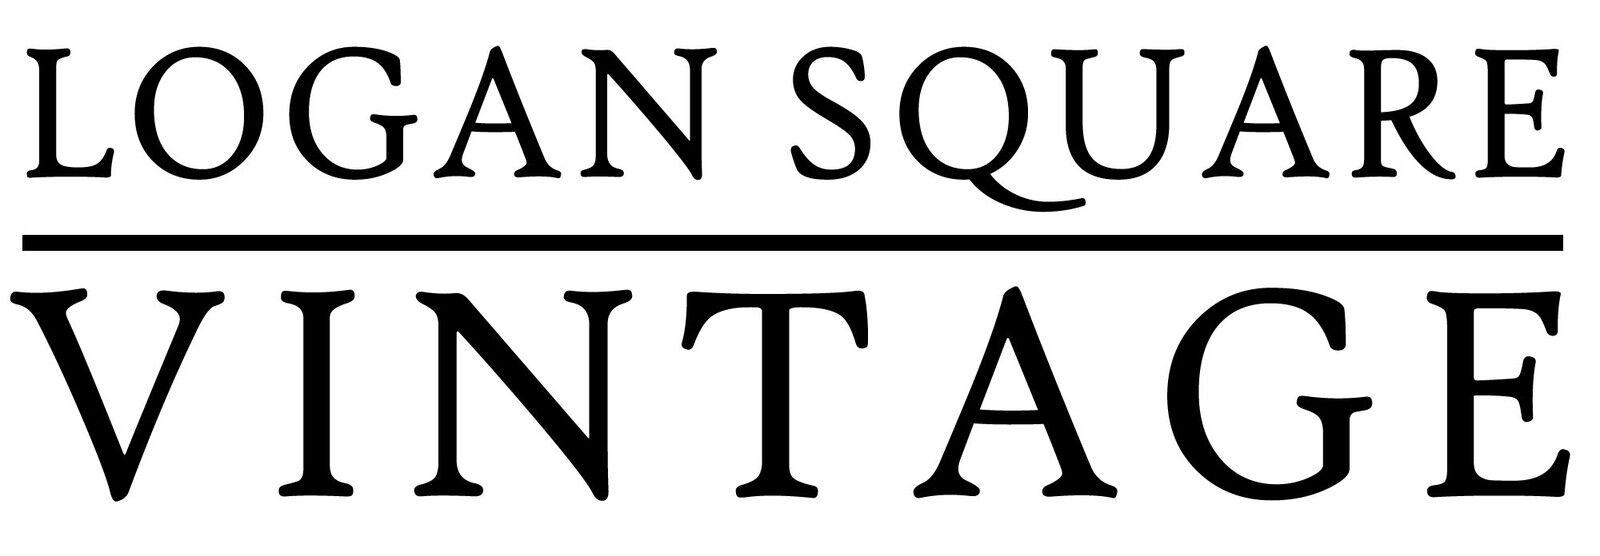 Logan Square Vintage